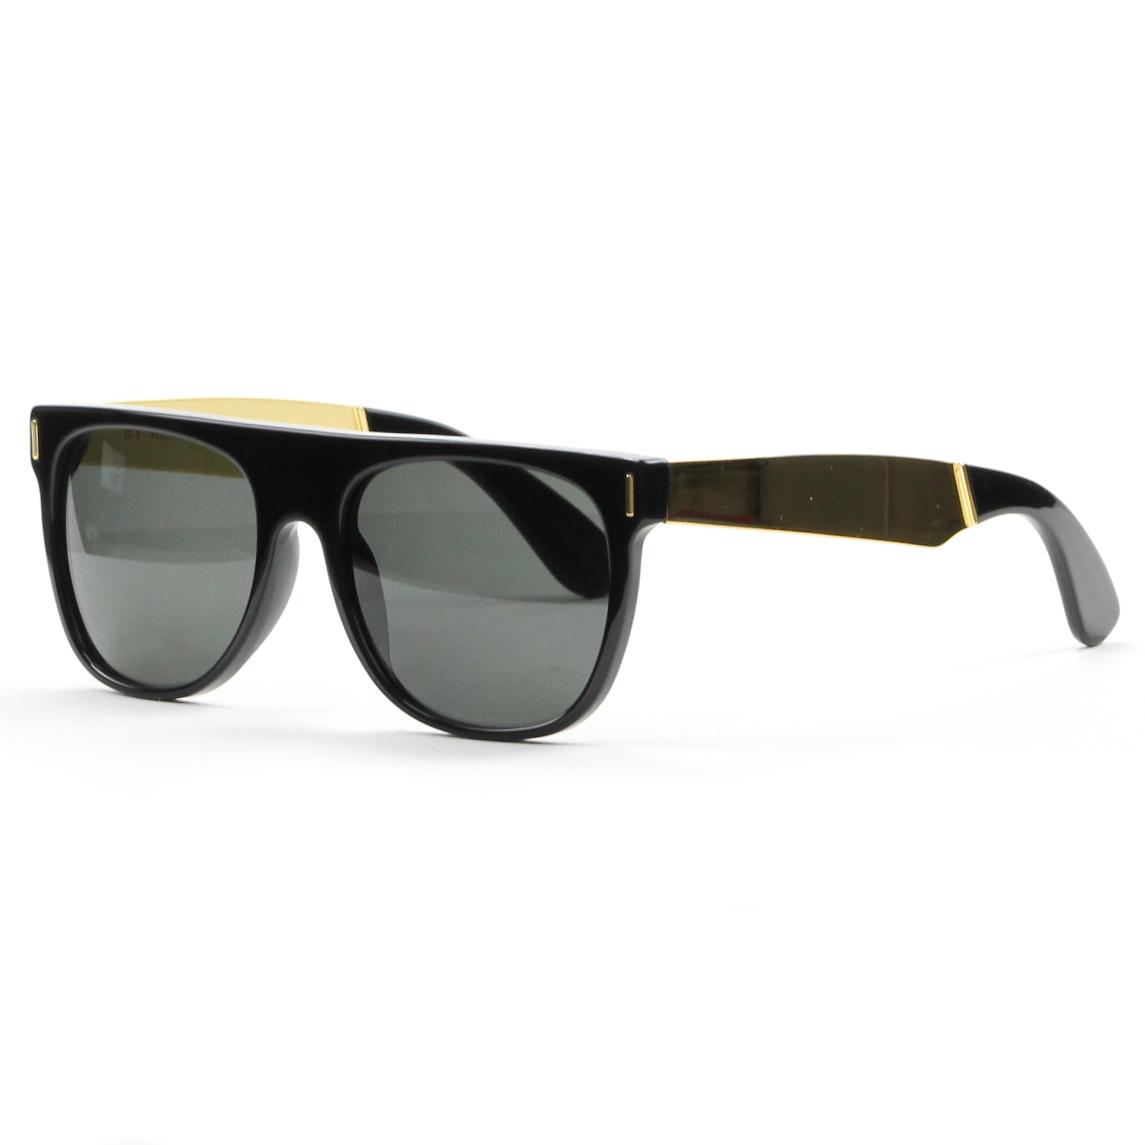 edc1ddd203b Super Flat Top Sunglasses Philippines